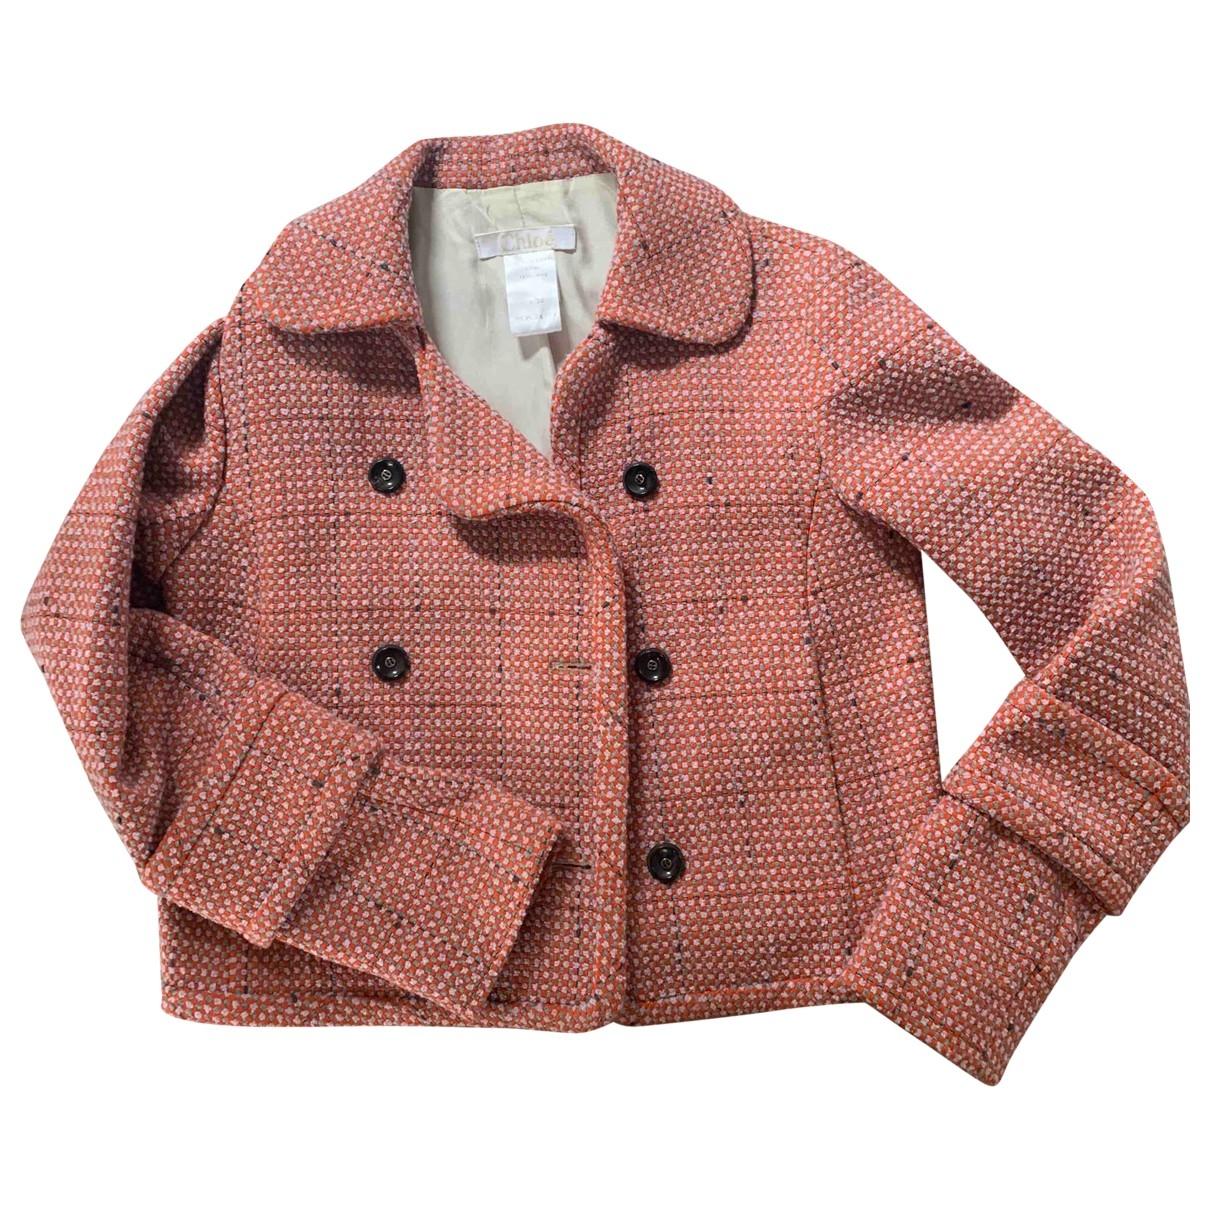 Chloé \N Orange Wool jacket for Women 38 FR